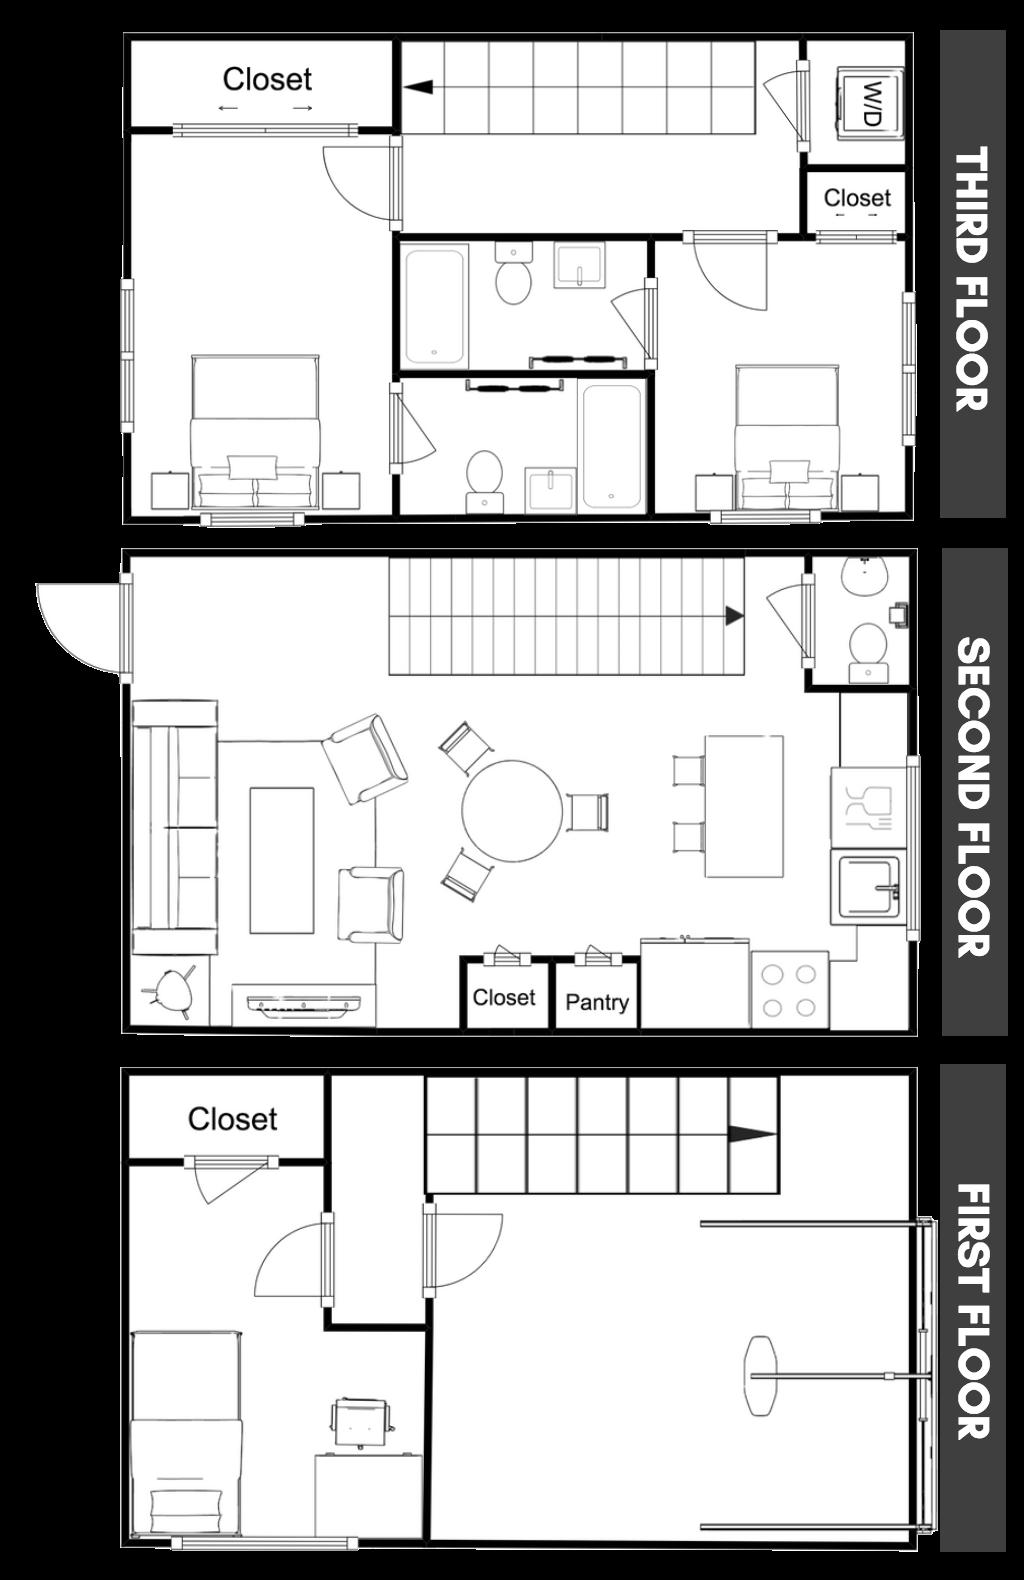 Greenbelt Station Townhome Floorplan